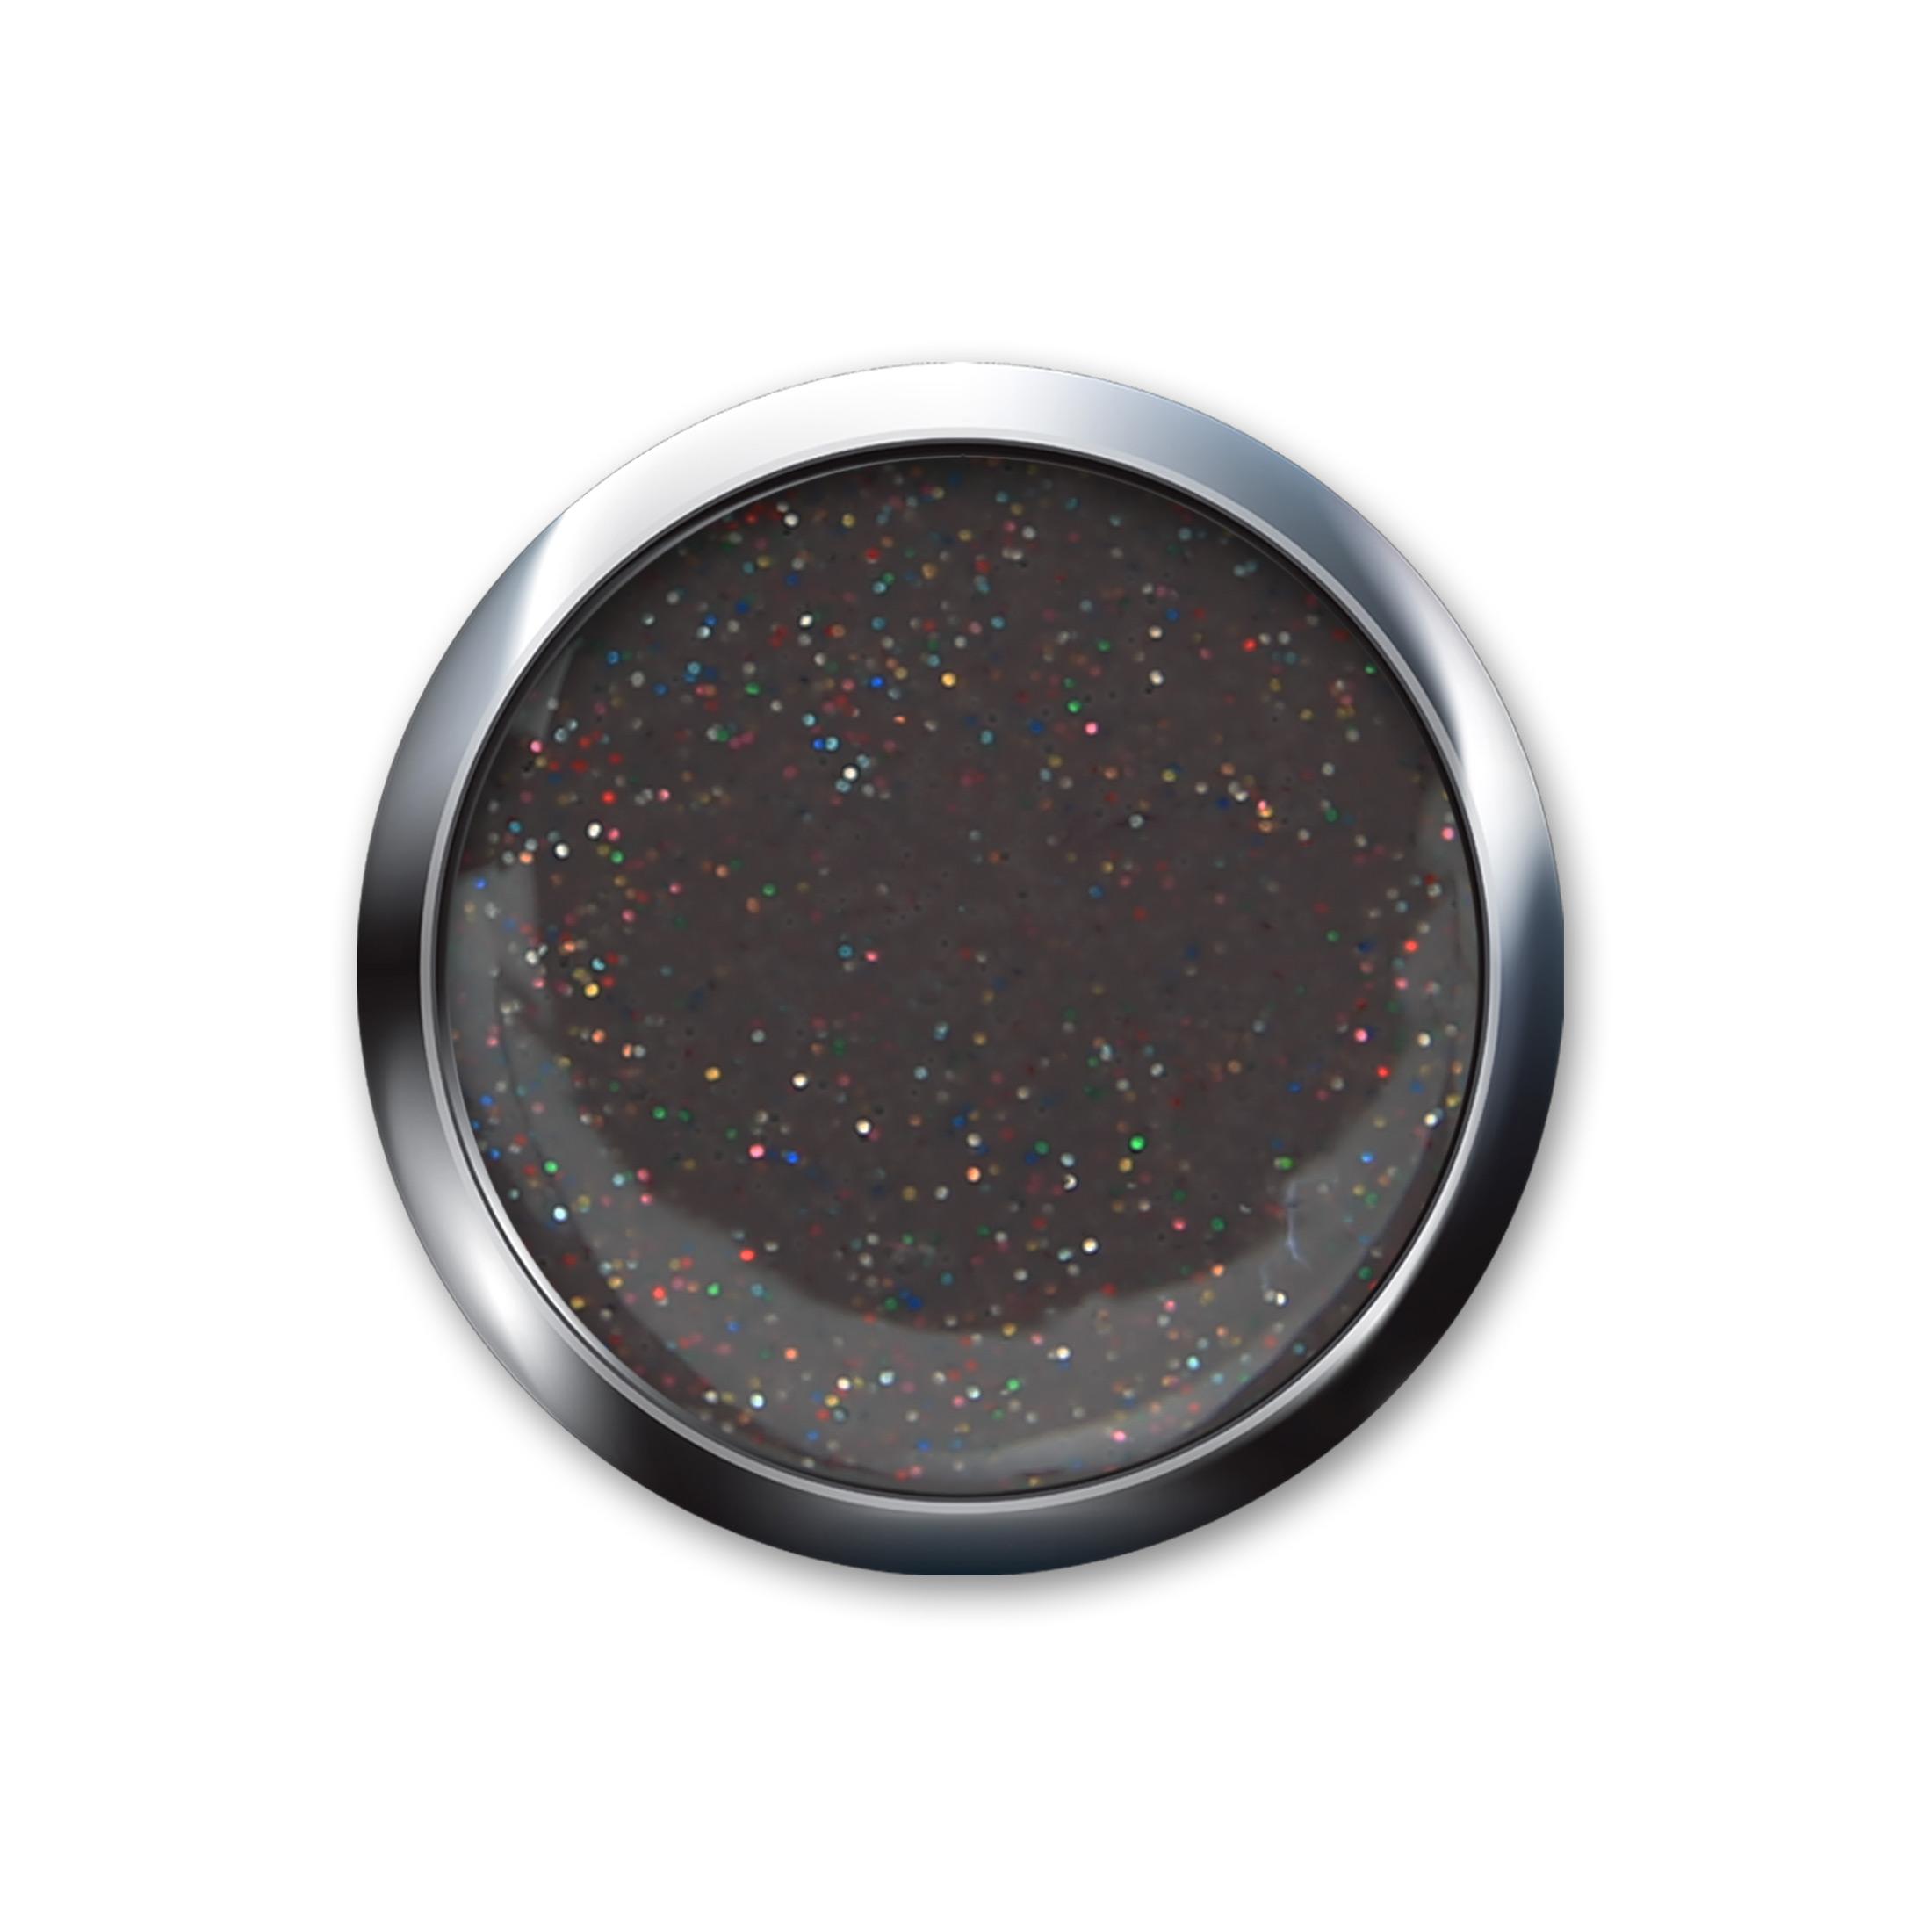 UV Gel Flux Colour High Definition - sparkling mud pie, 5ml (GFCHD ...